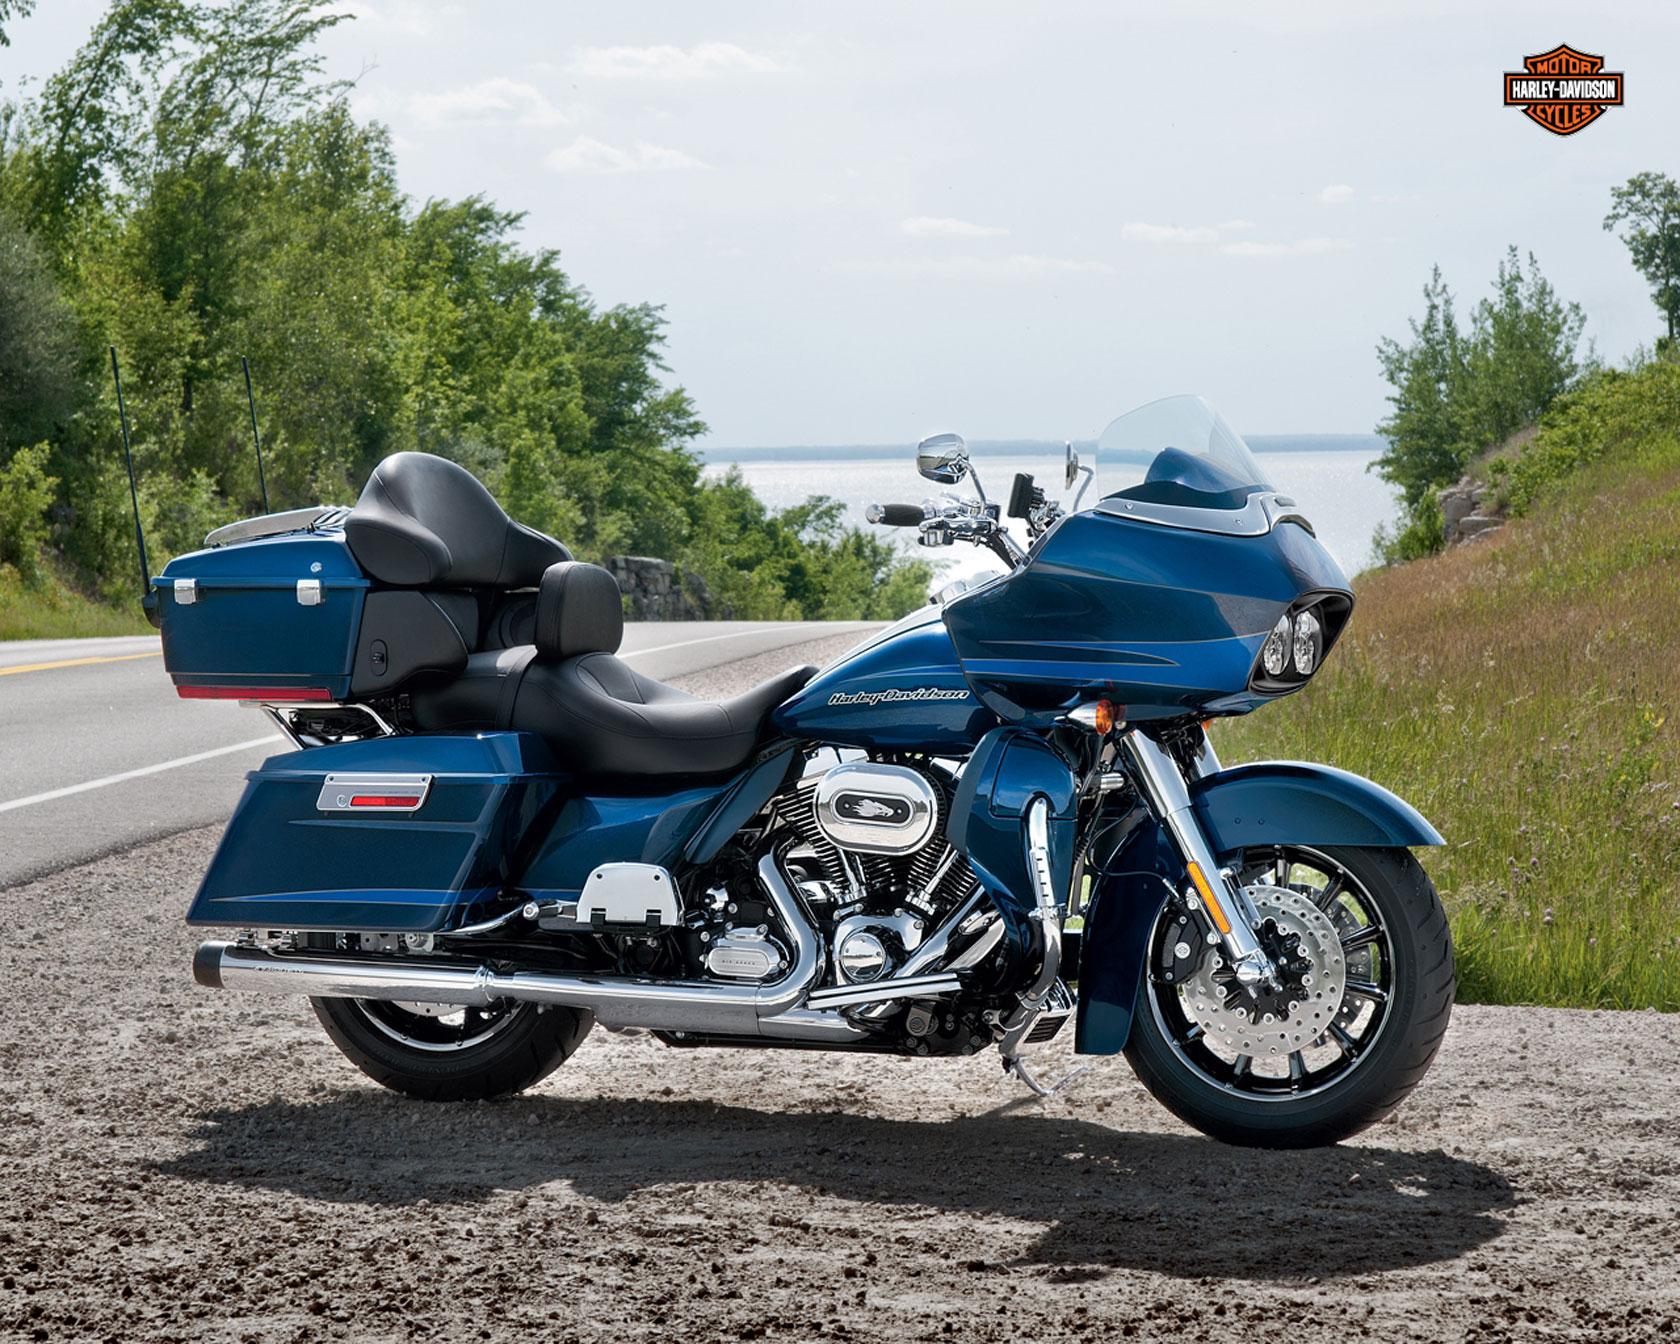 Harley Davidson Fltru